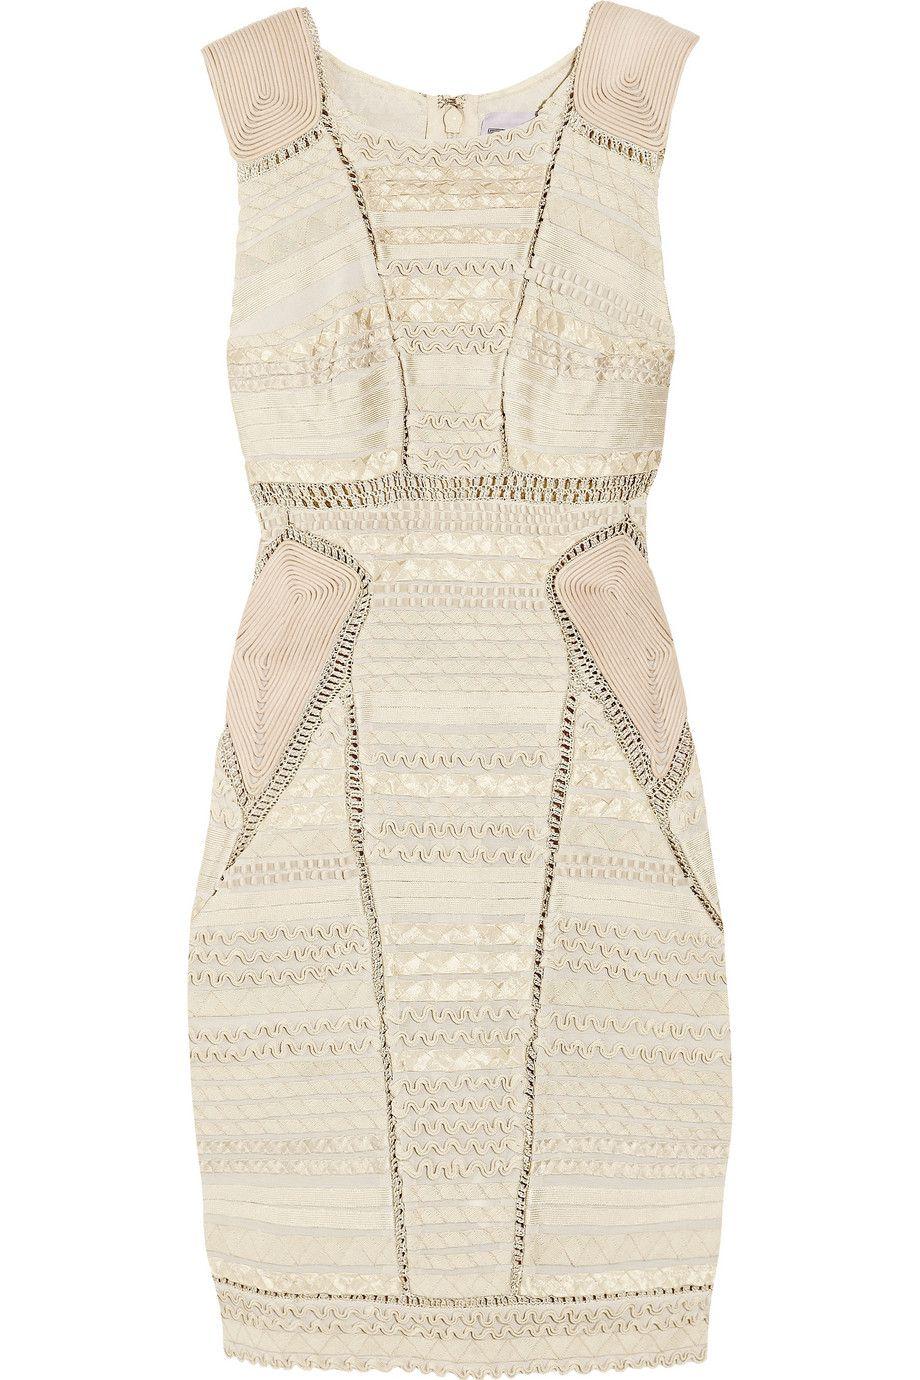 Perfect combo hervé léger ribbon and crochet bandage dress to